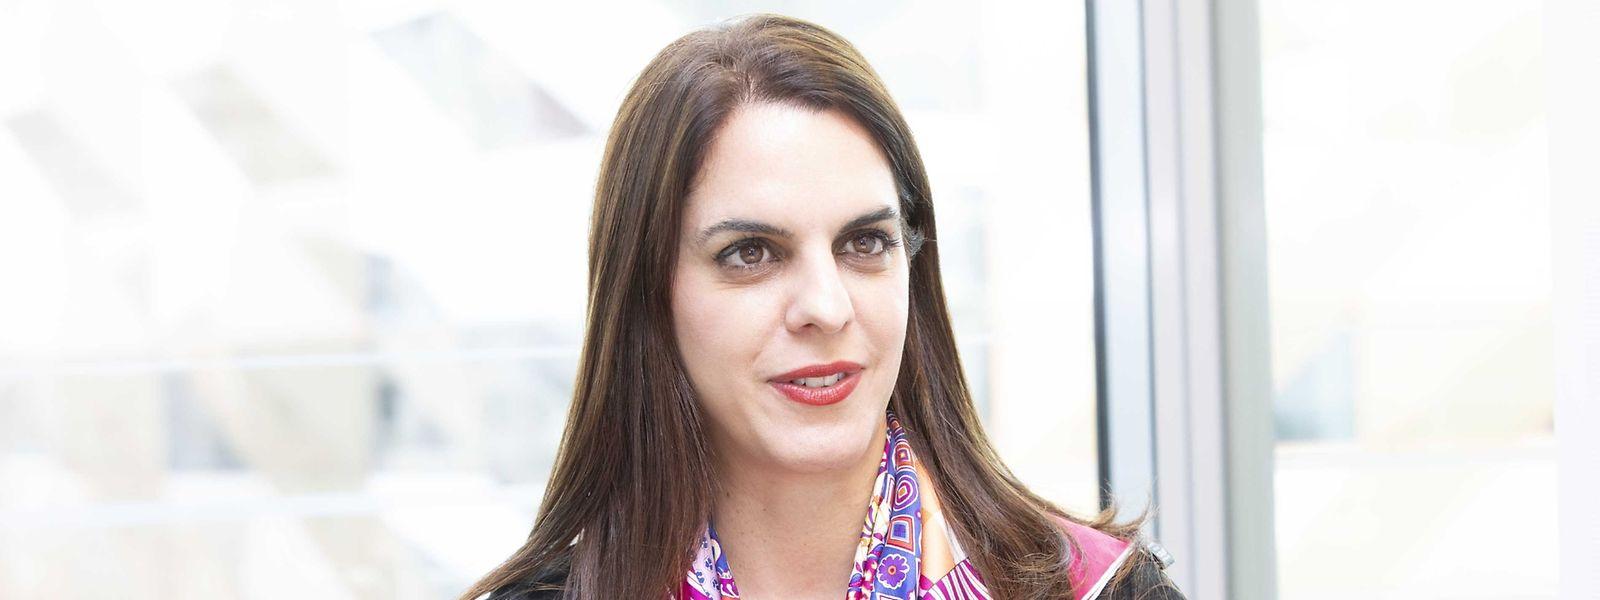 Sarah Khabirpour leitet bei der Banque de Luxembourg den Bereich Compliance.